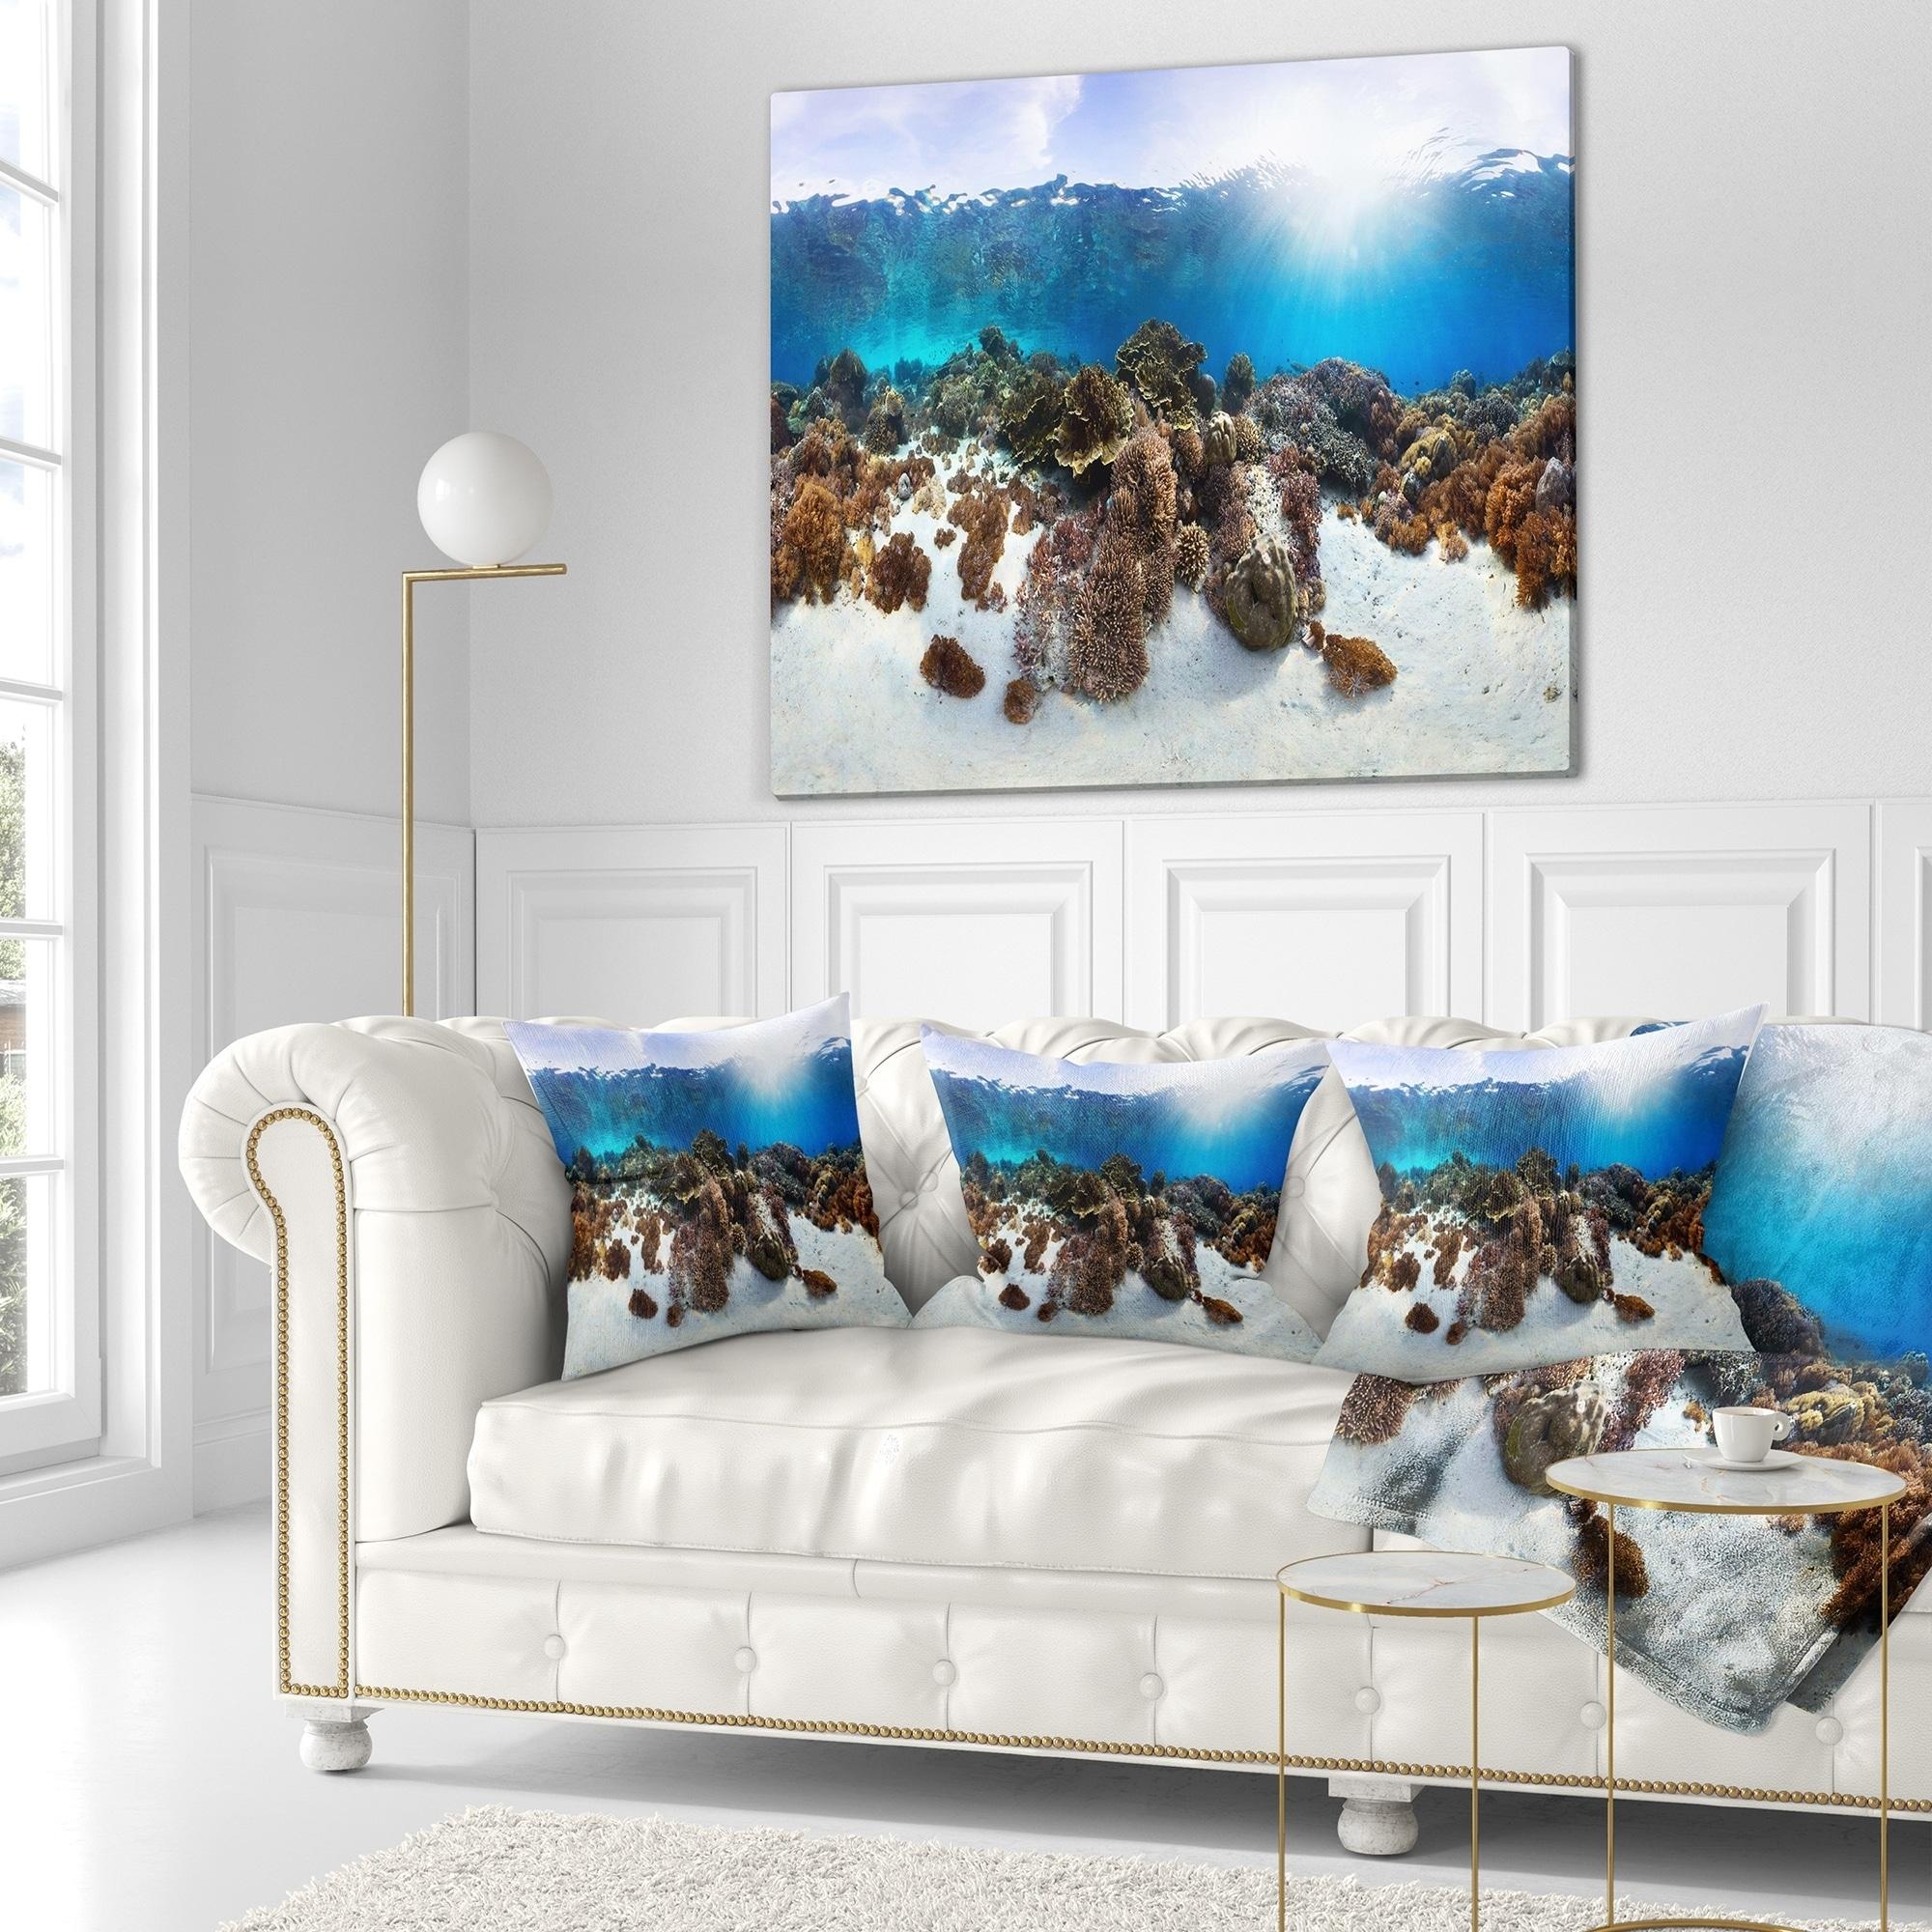 Designart Indonesia Underwater Panorama Photography Throw Blanket On Sale Overstock 20910101 71 In X 59 In